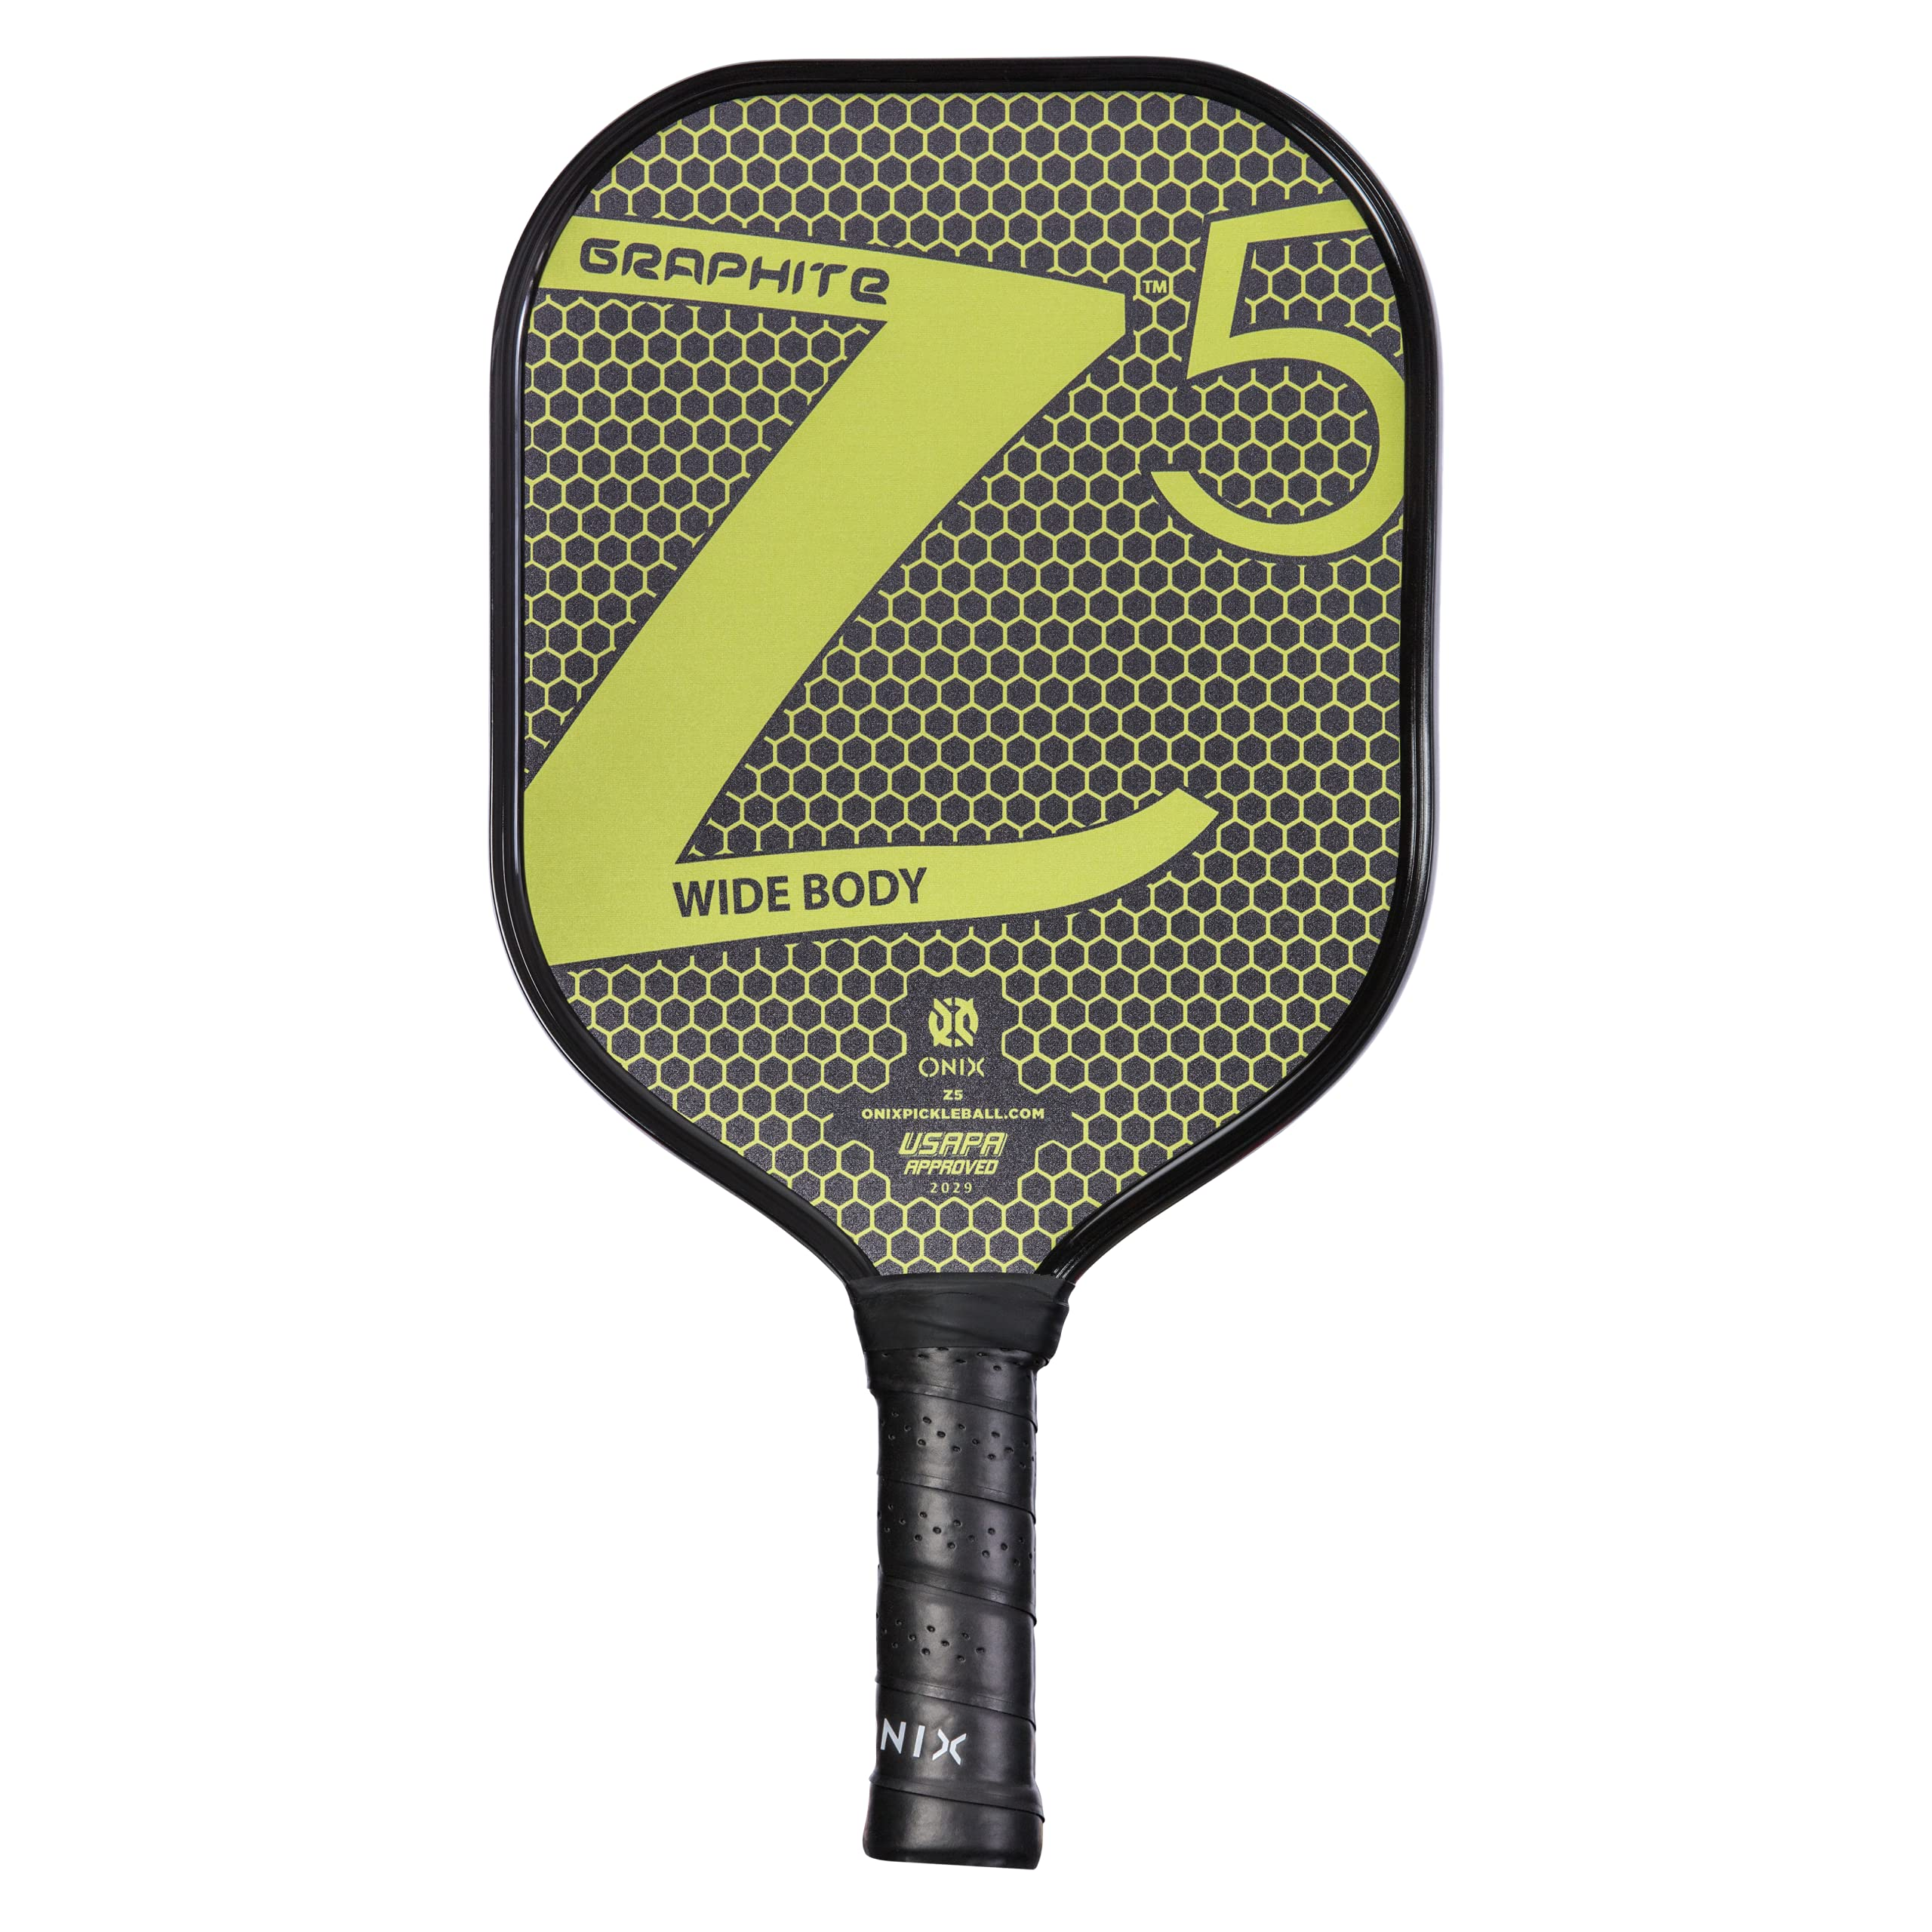 ONIX Graphite Z5 Graphite Carbon Fiber Pickleball Padd -P03X